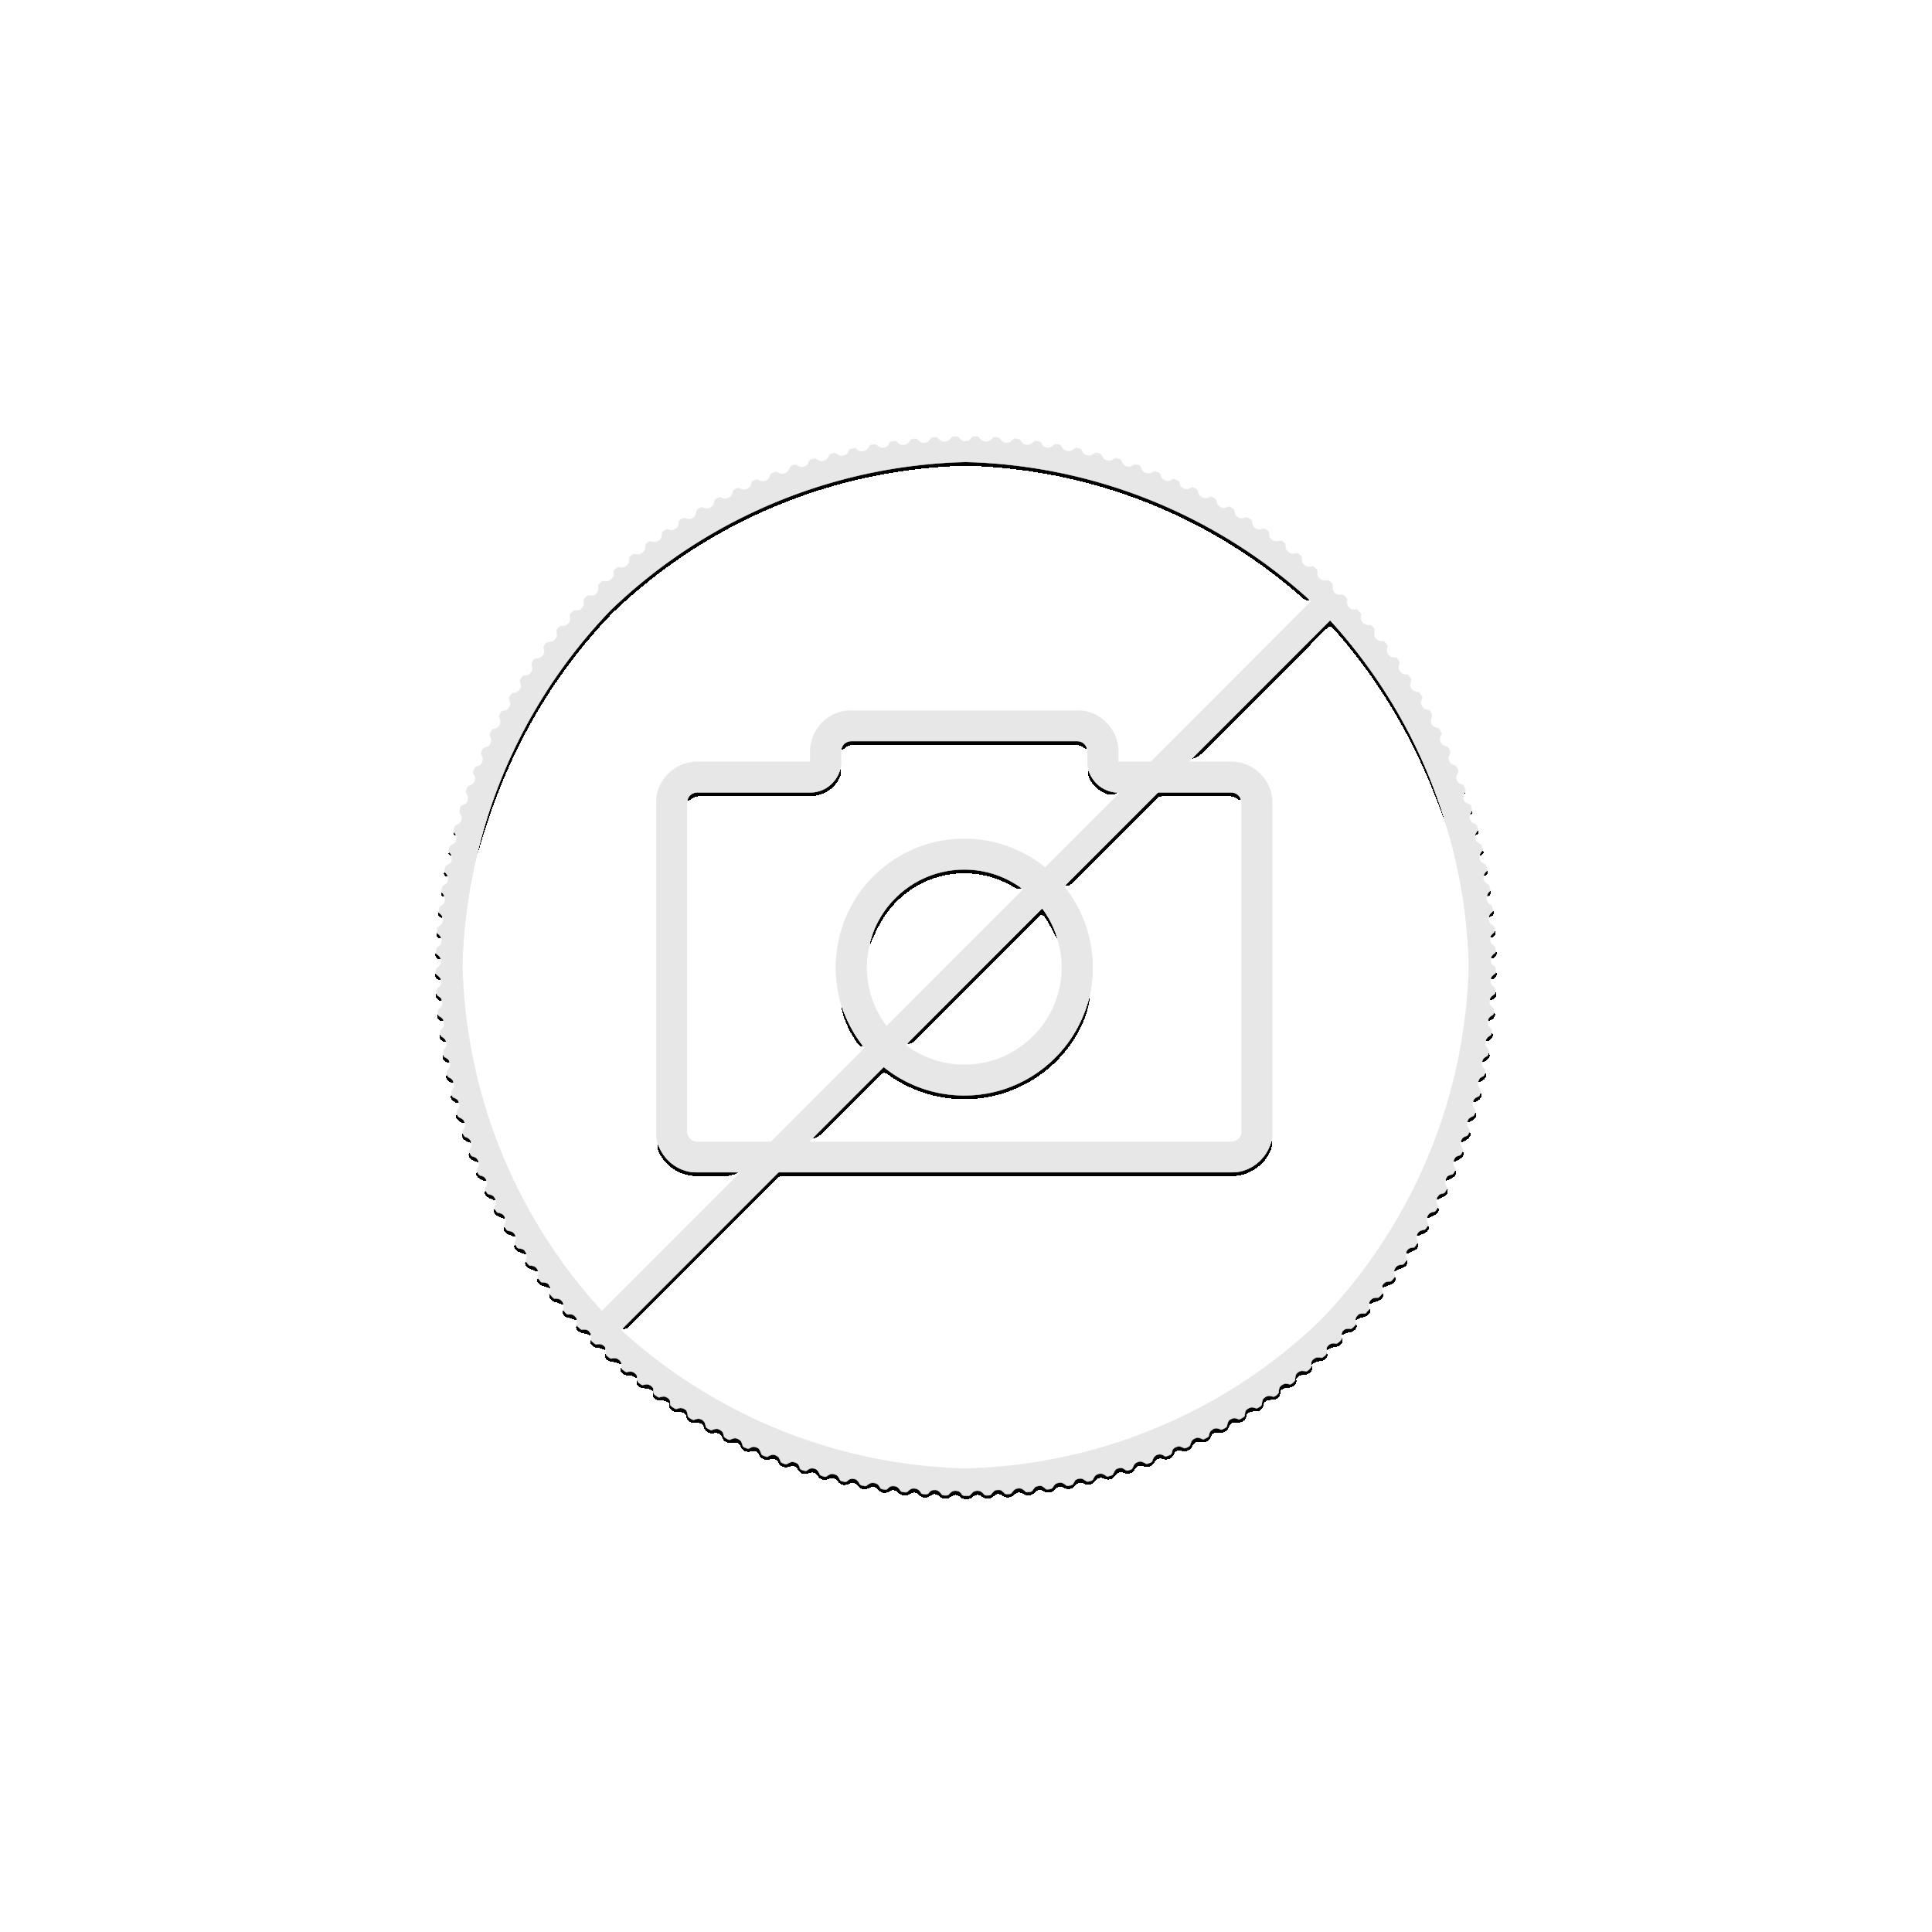 Gold 1/10 troy ounce gold Kangaroo coin